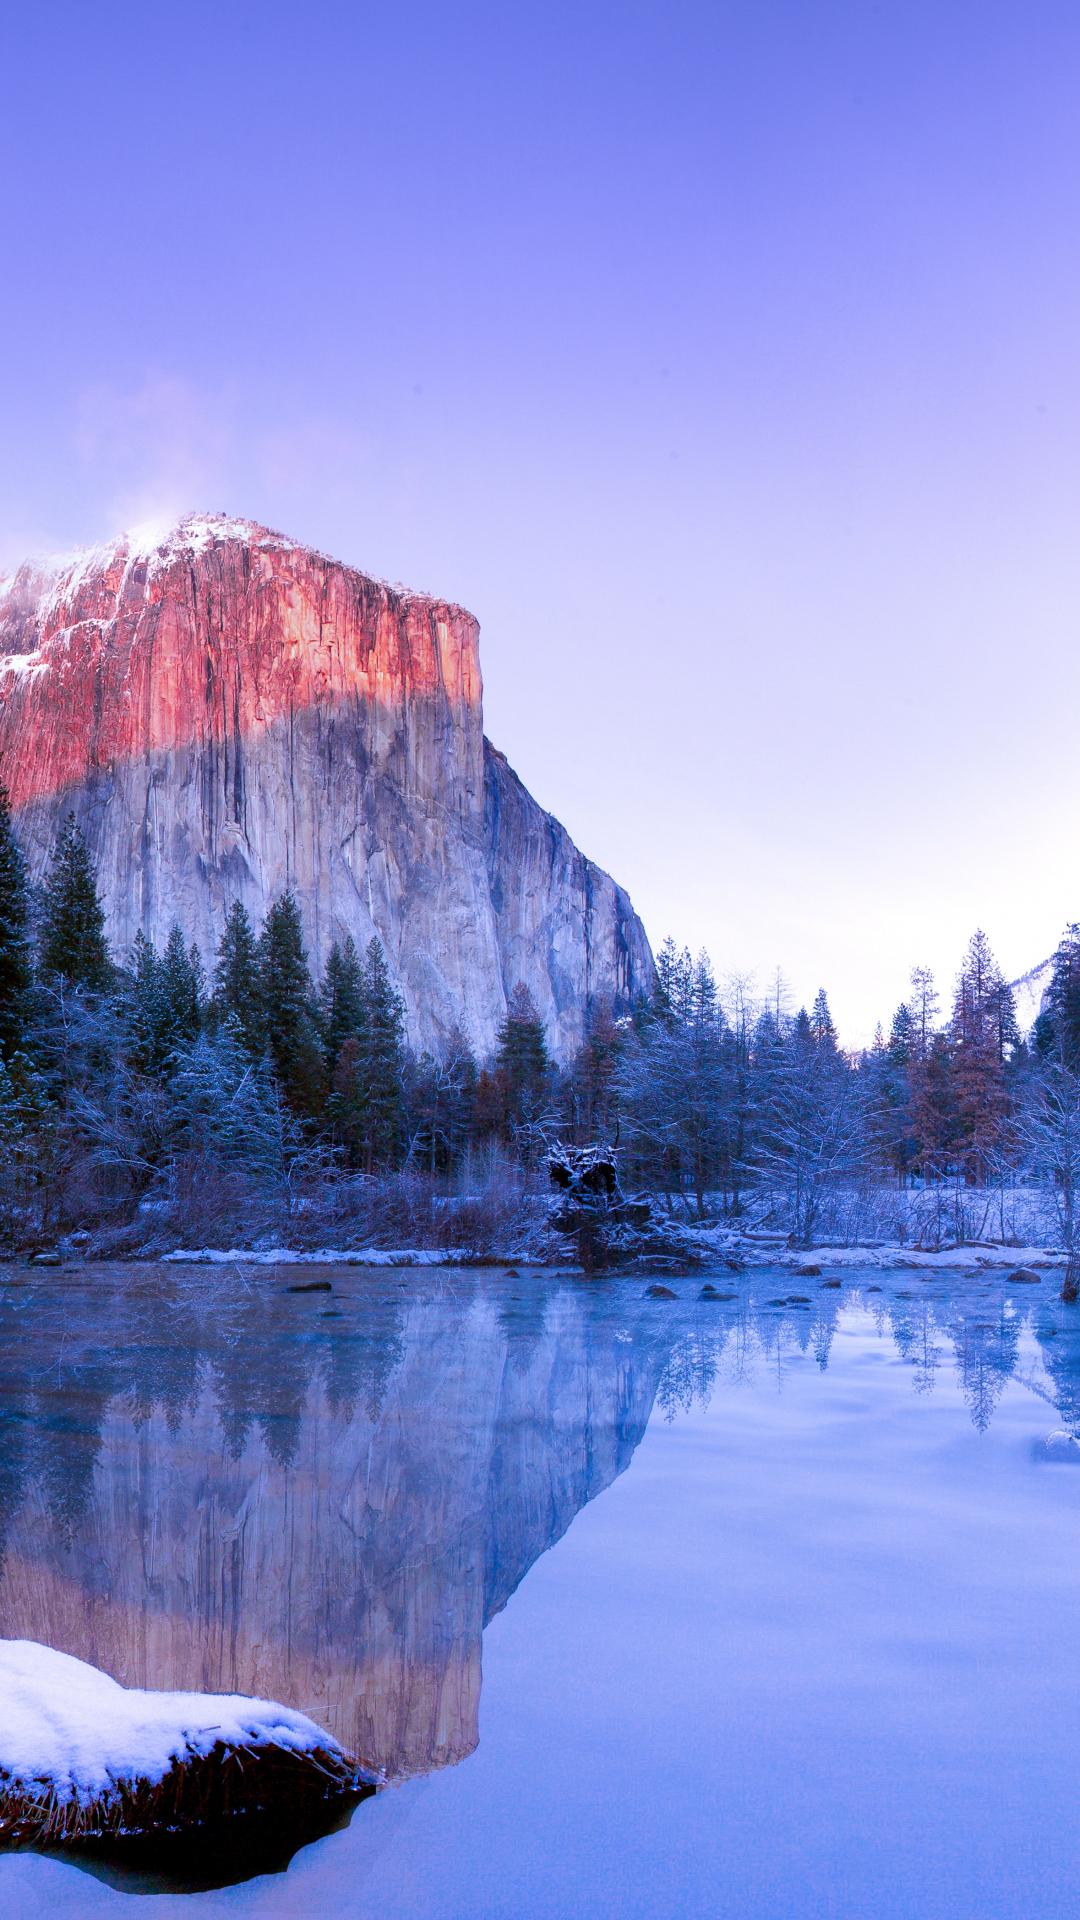 Iphone 5 Wallpaper Floral Yosemite Lake Iphone Wallpaper Idrop News